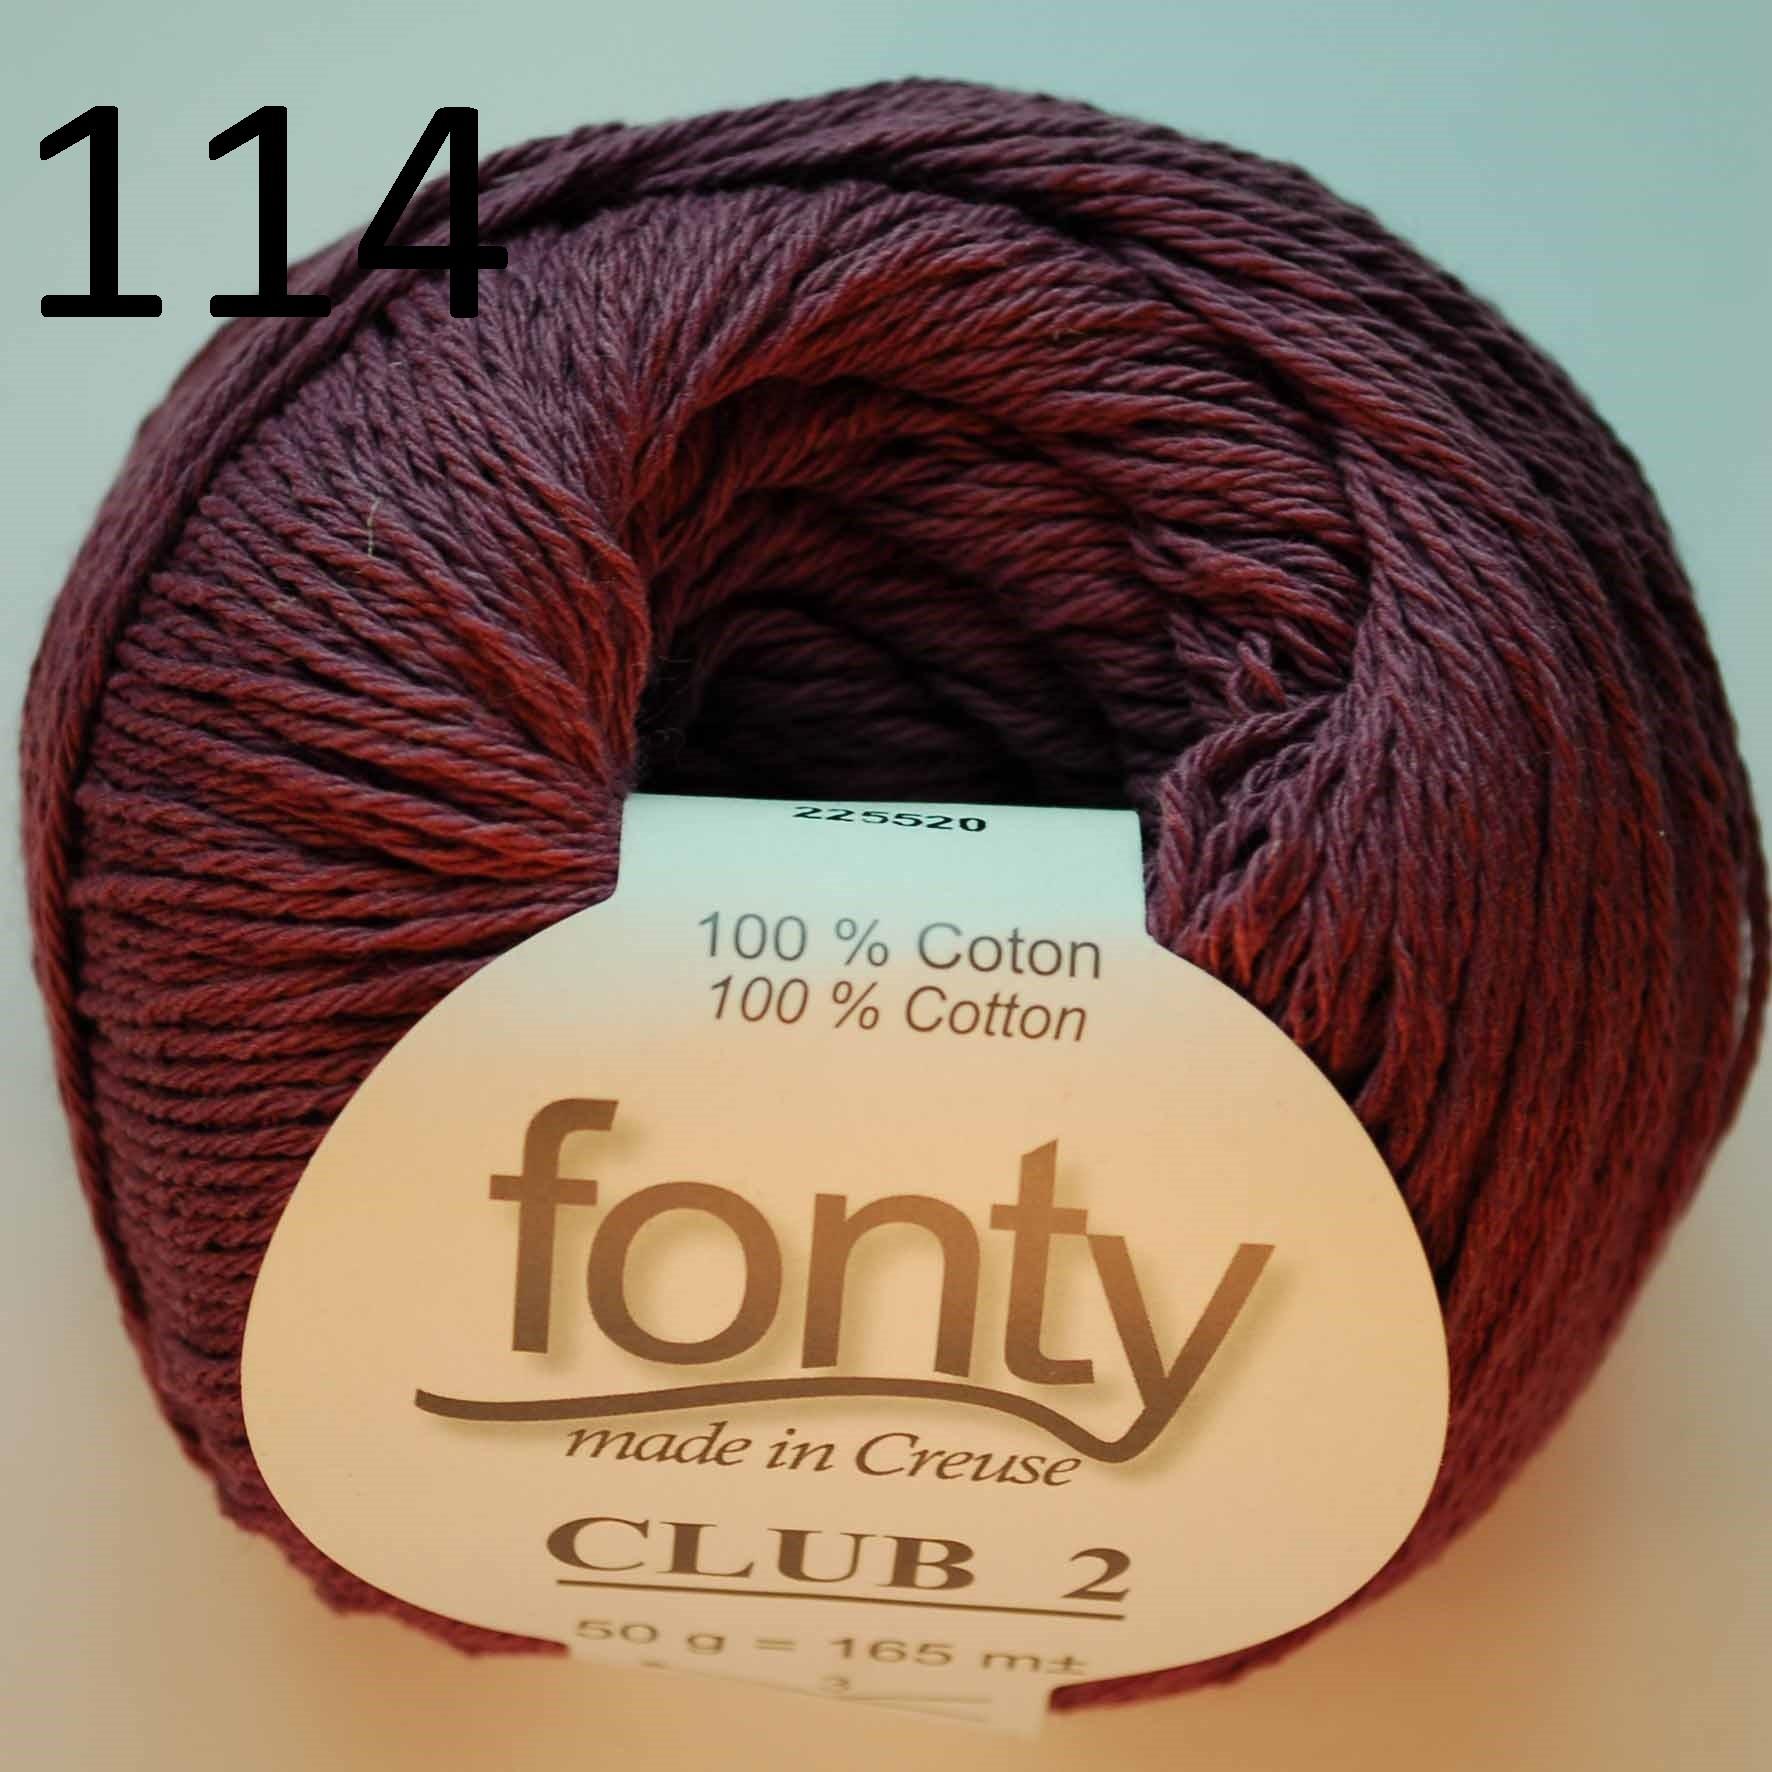 Club 2 114